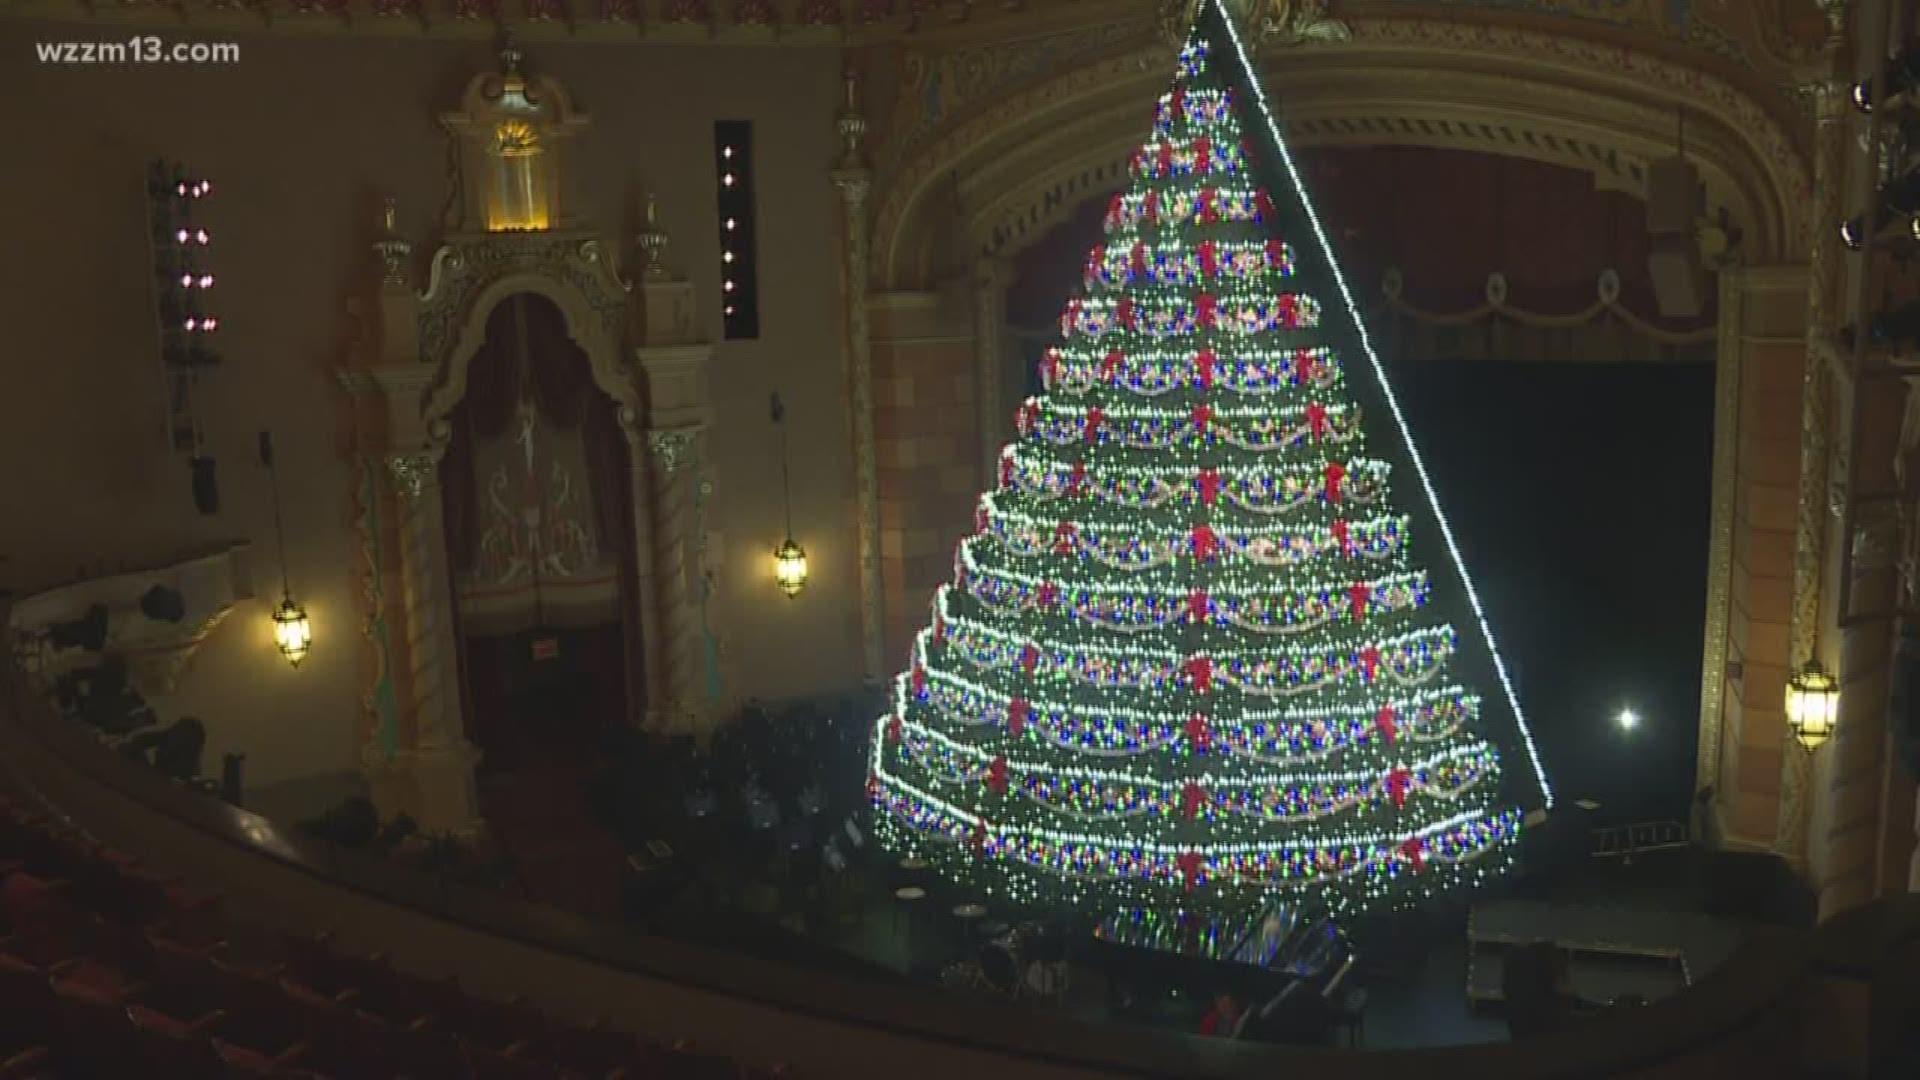 Singing Christmas Tree Muskegon 2021 Take A Trip Behind The Scenes Of Mona Shores Singing Christmas Tree King5 Com